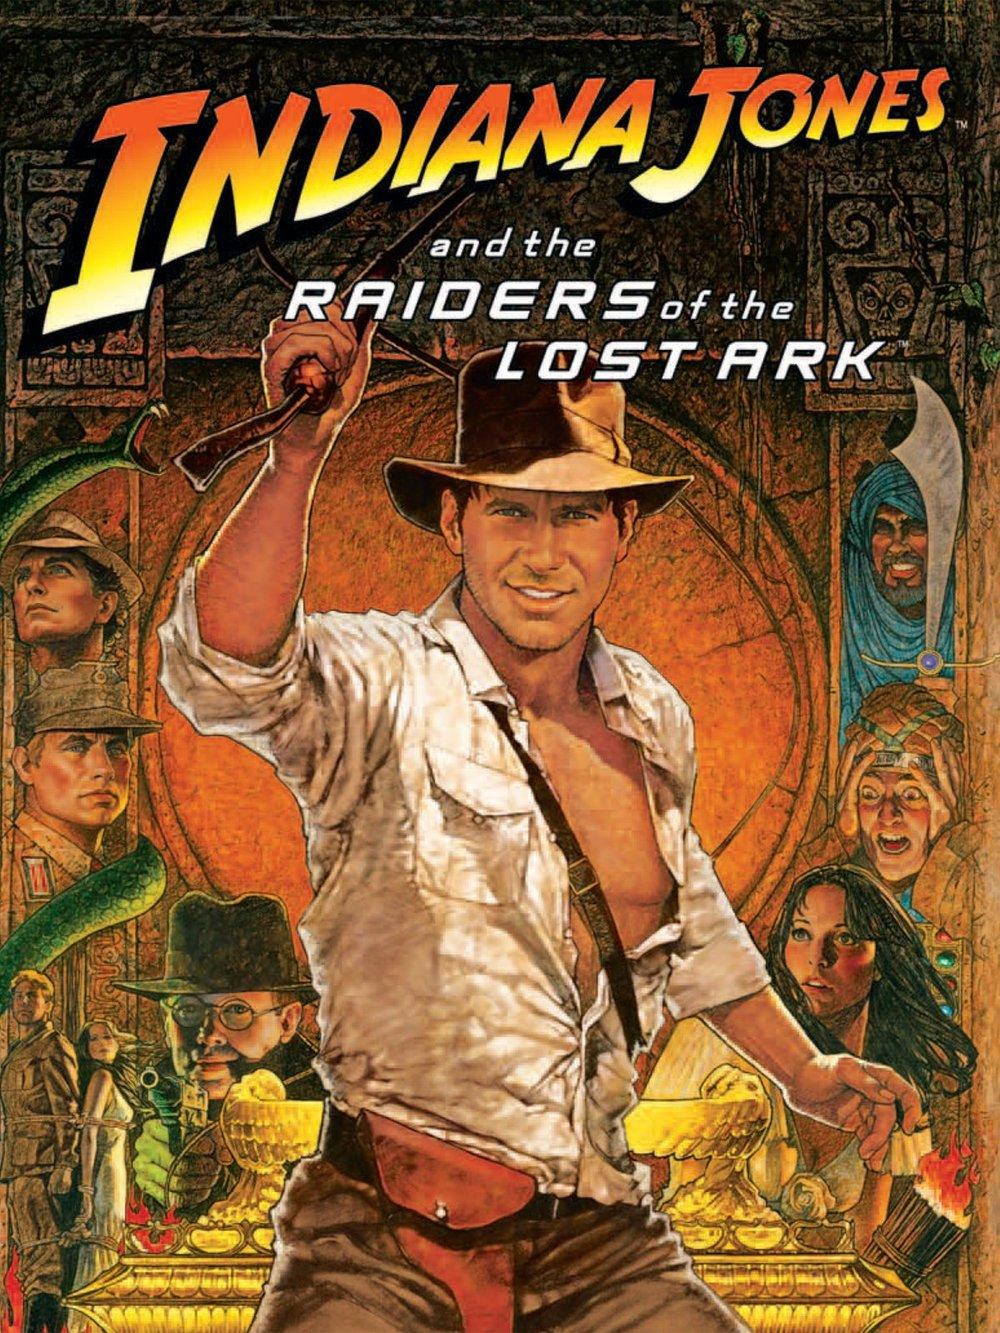 indiana-jones-raiders-of-the-lost-ark.jpg